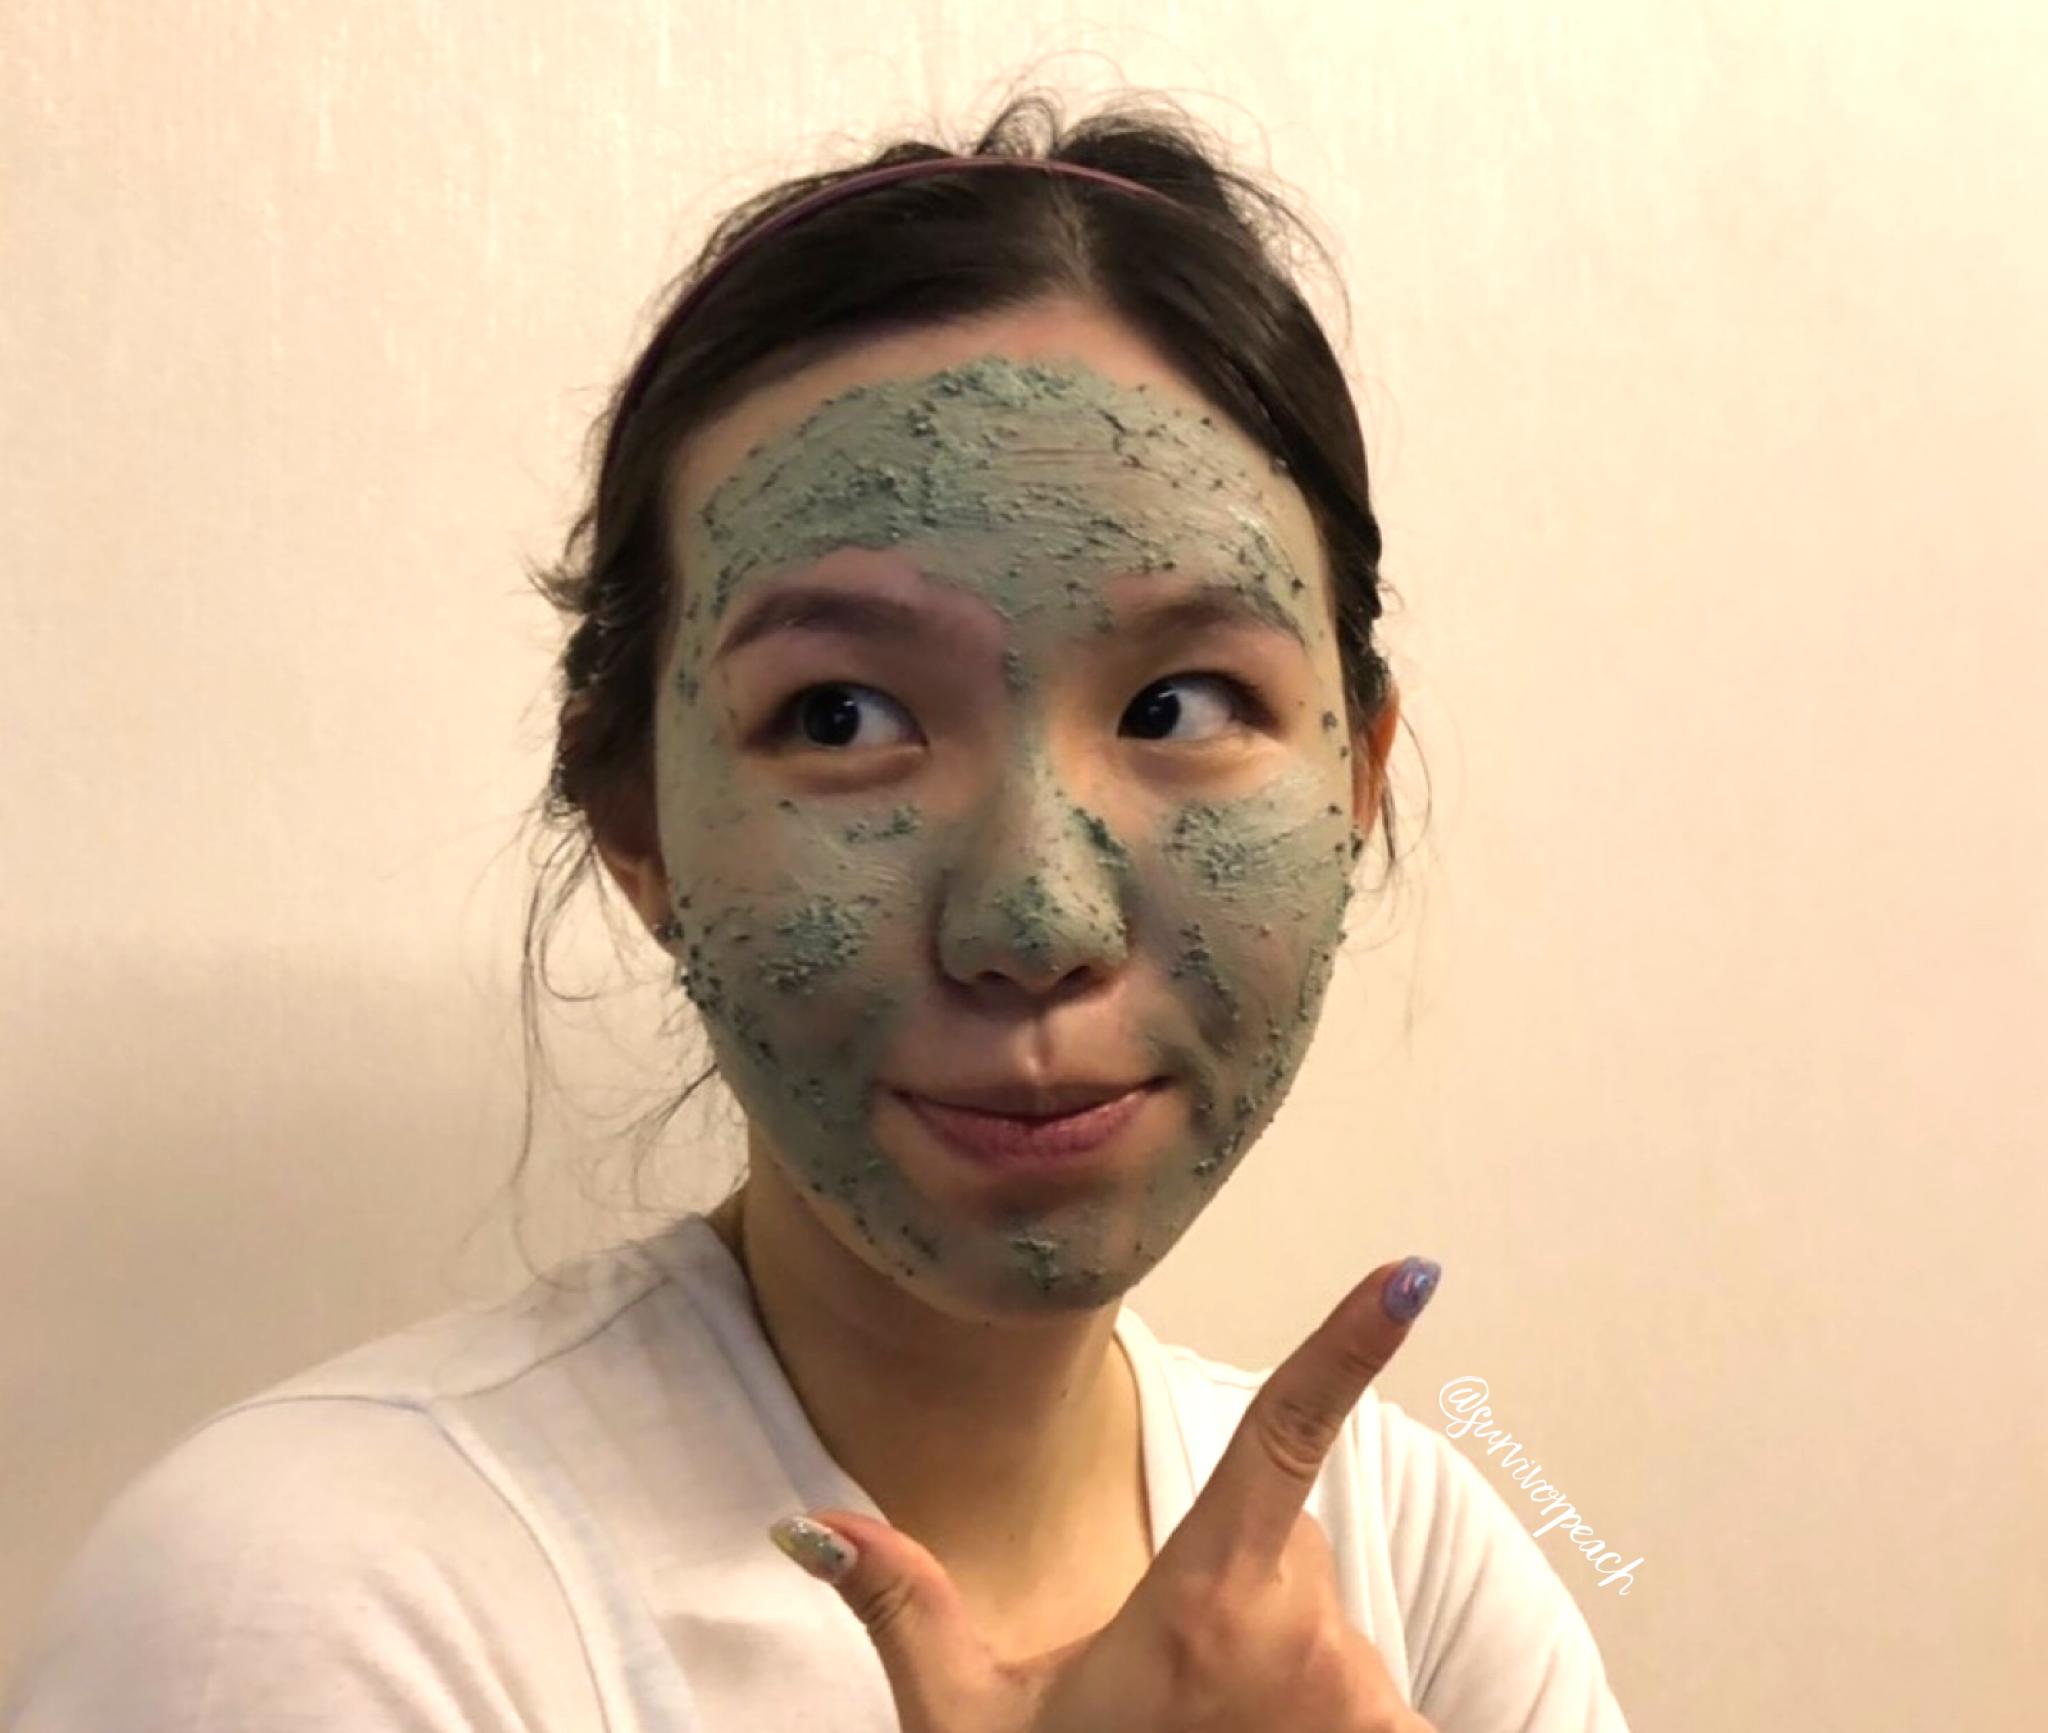 Me wearing Lush Mask of Magnaminty